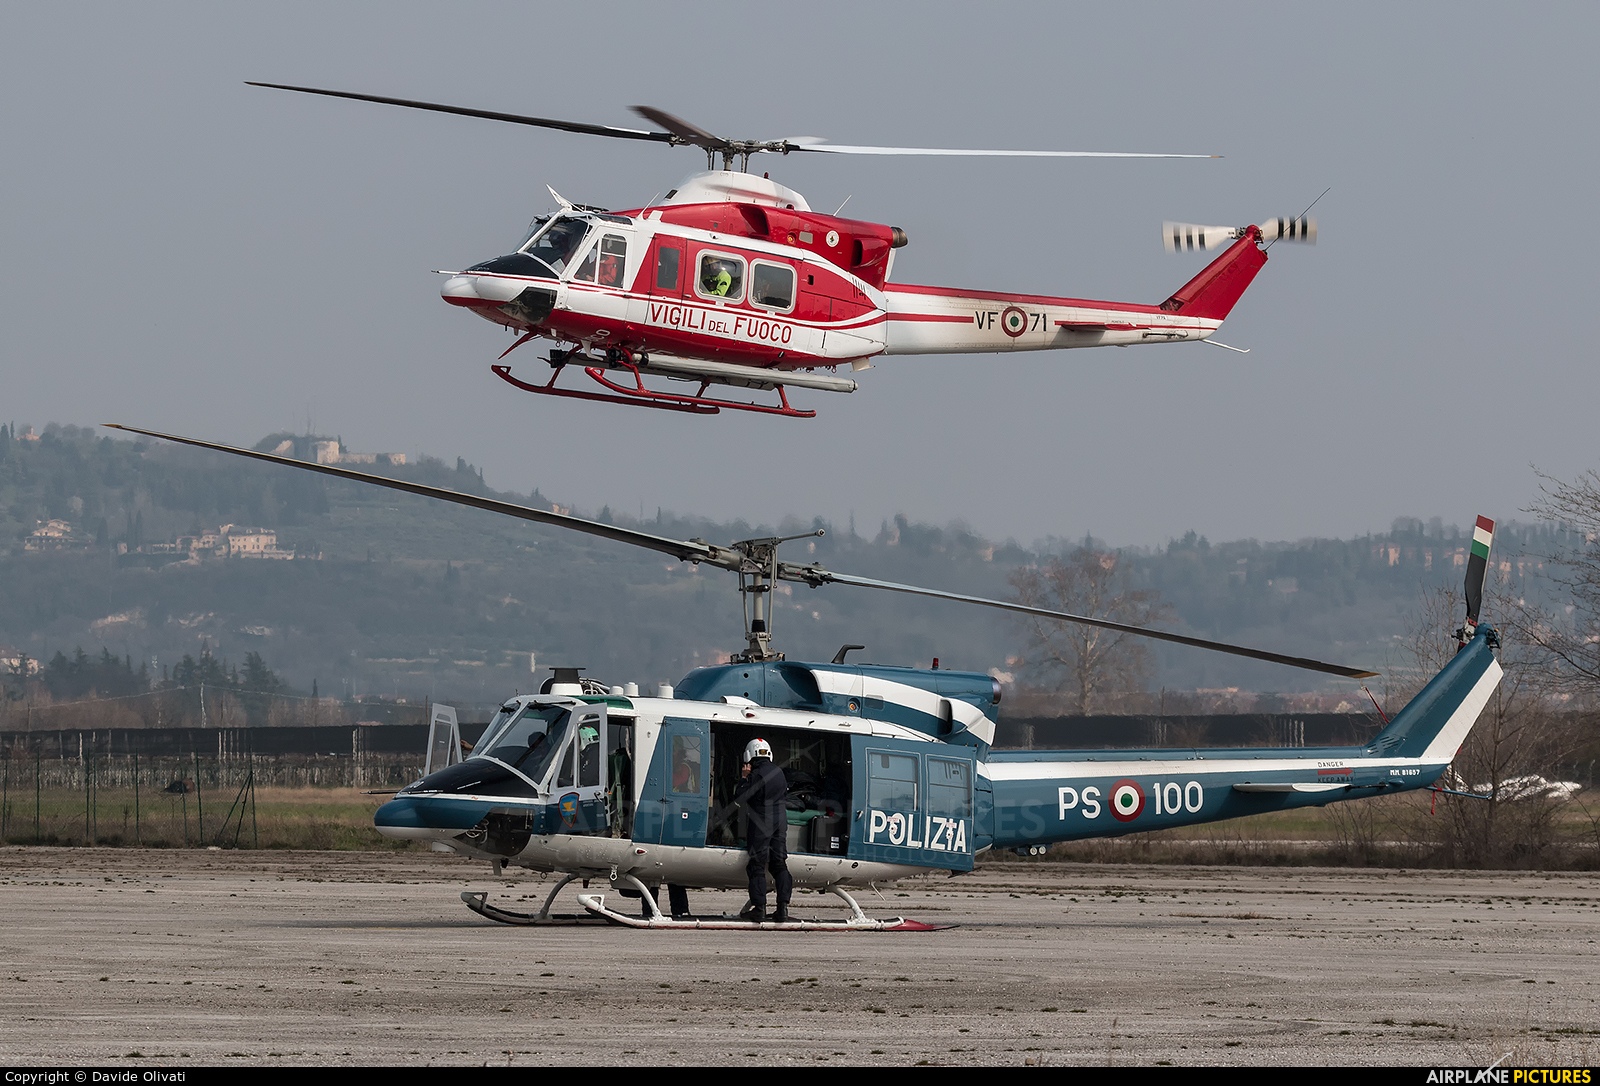 Italy - Police MM81657 aircraft at Verona - Boscomantico